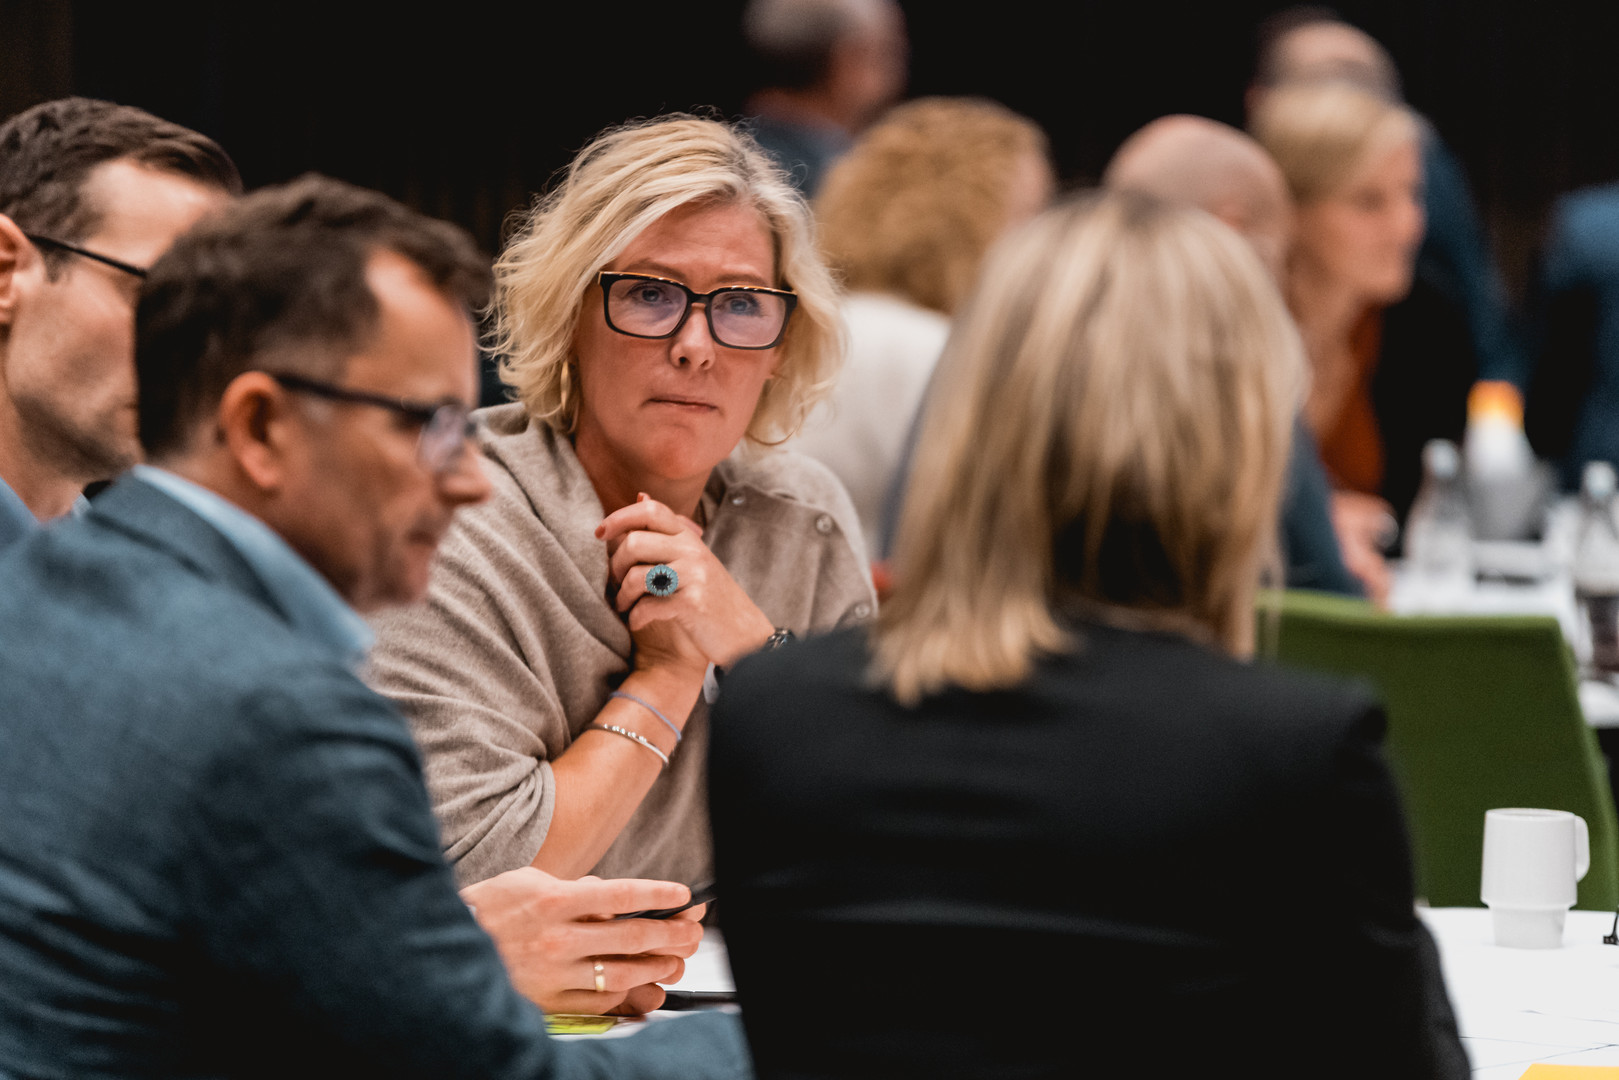 næringsforeningen-workshop (45 of 63).j